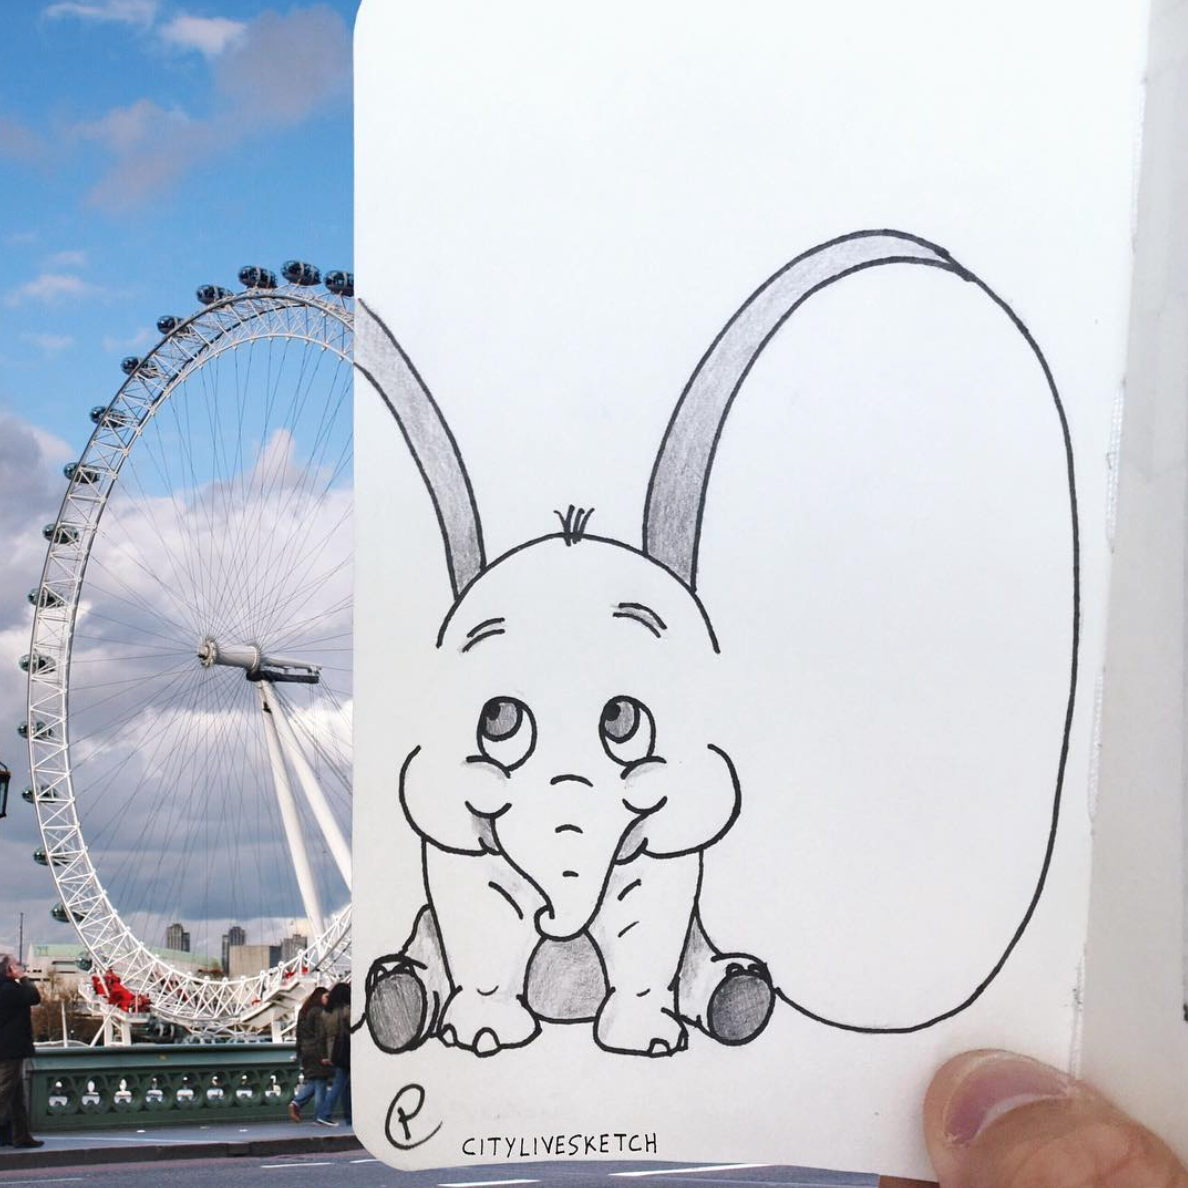 CityLiveSketch's Instagram